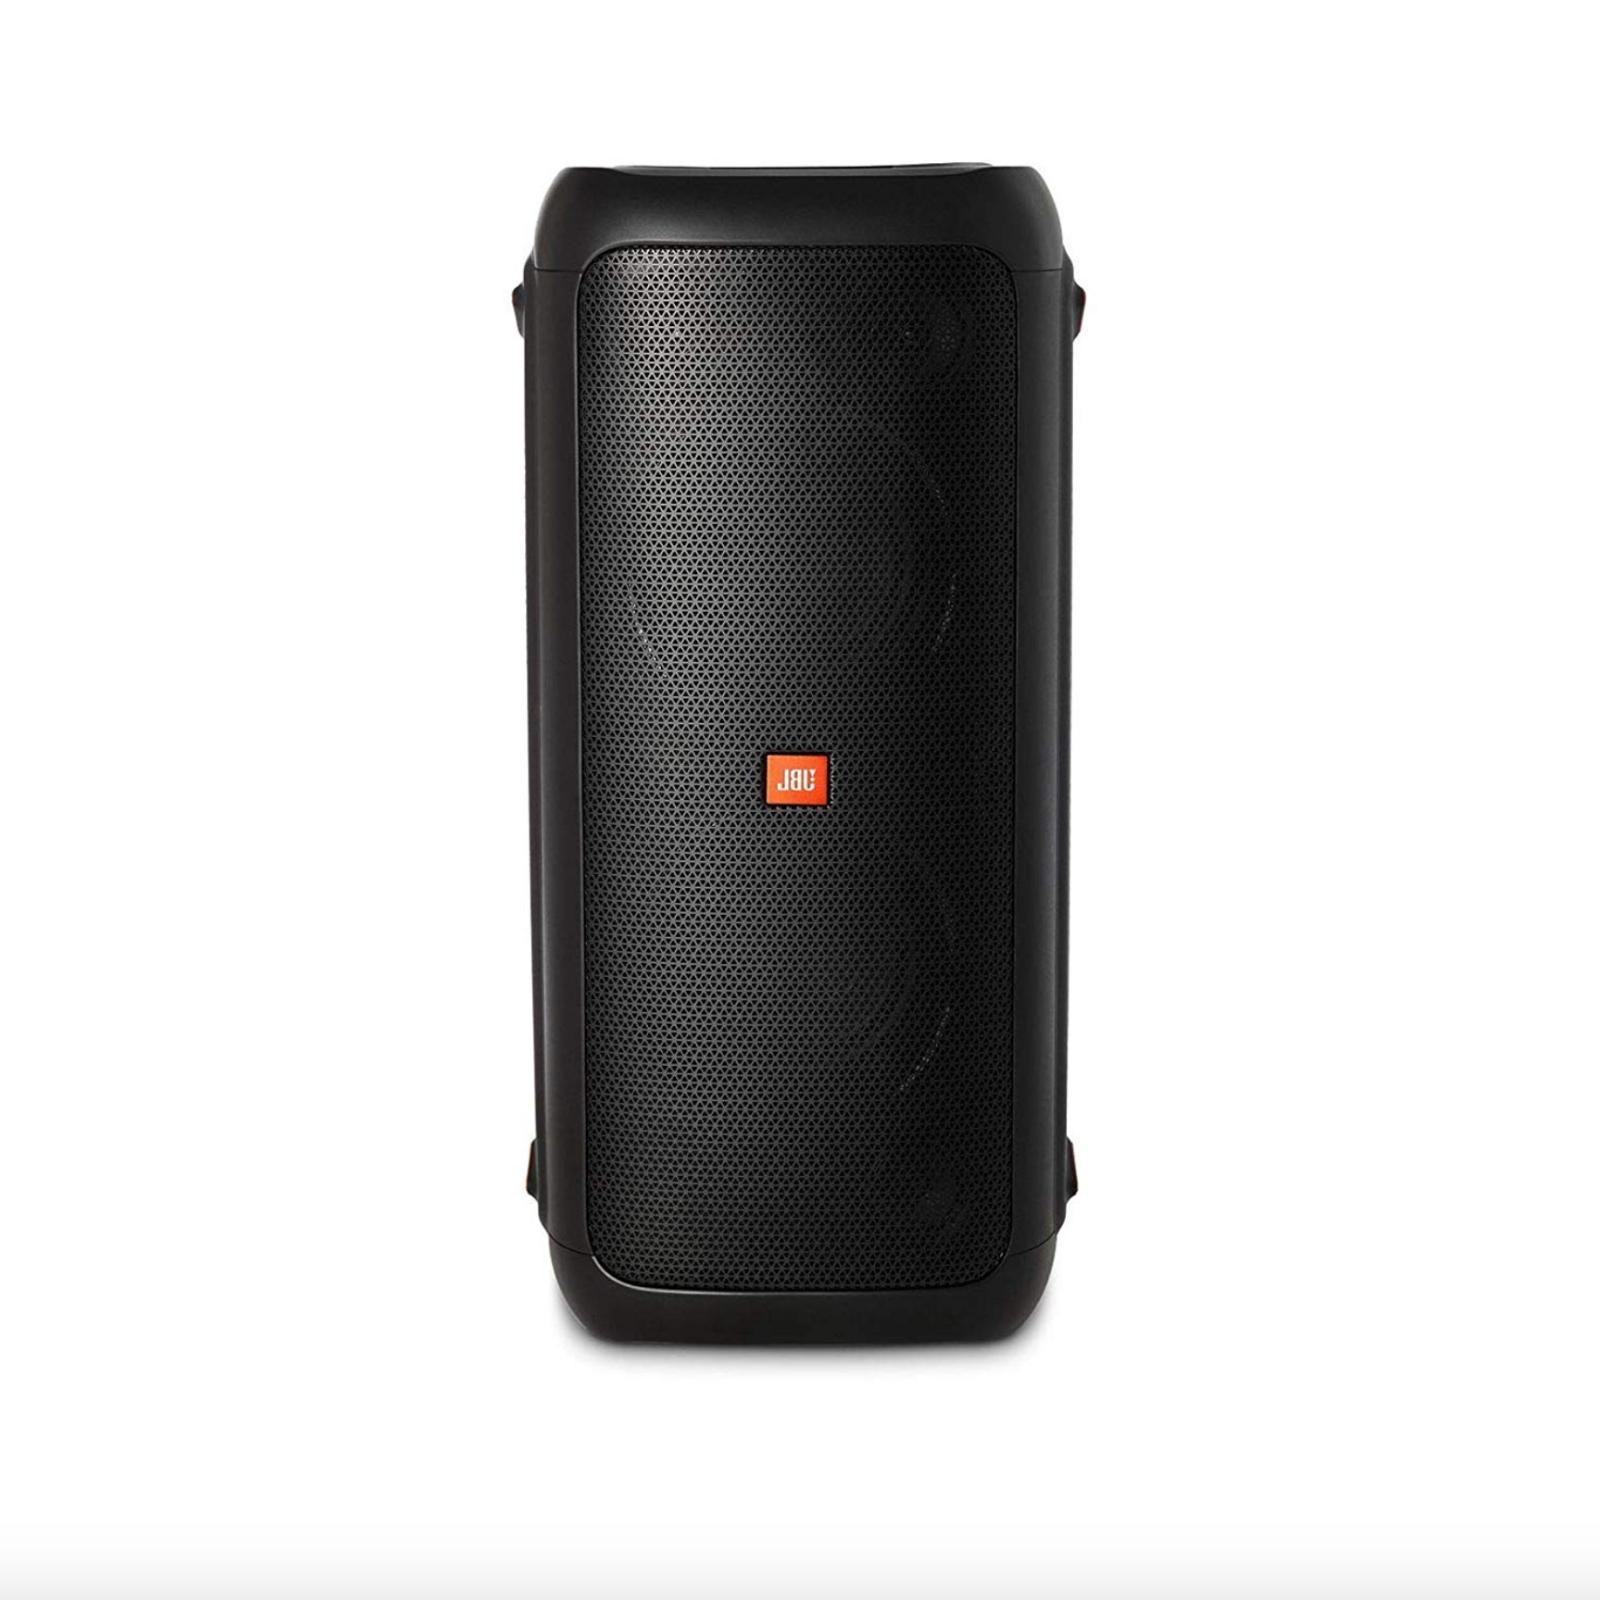 JBL Speaker Waterproof Outdoor Favors hours